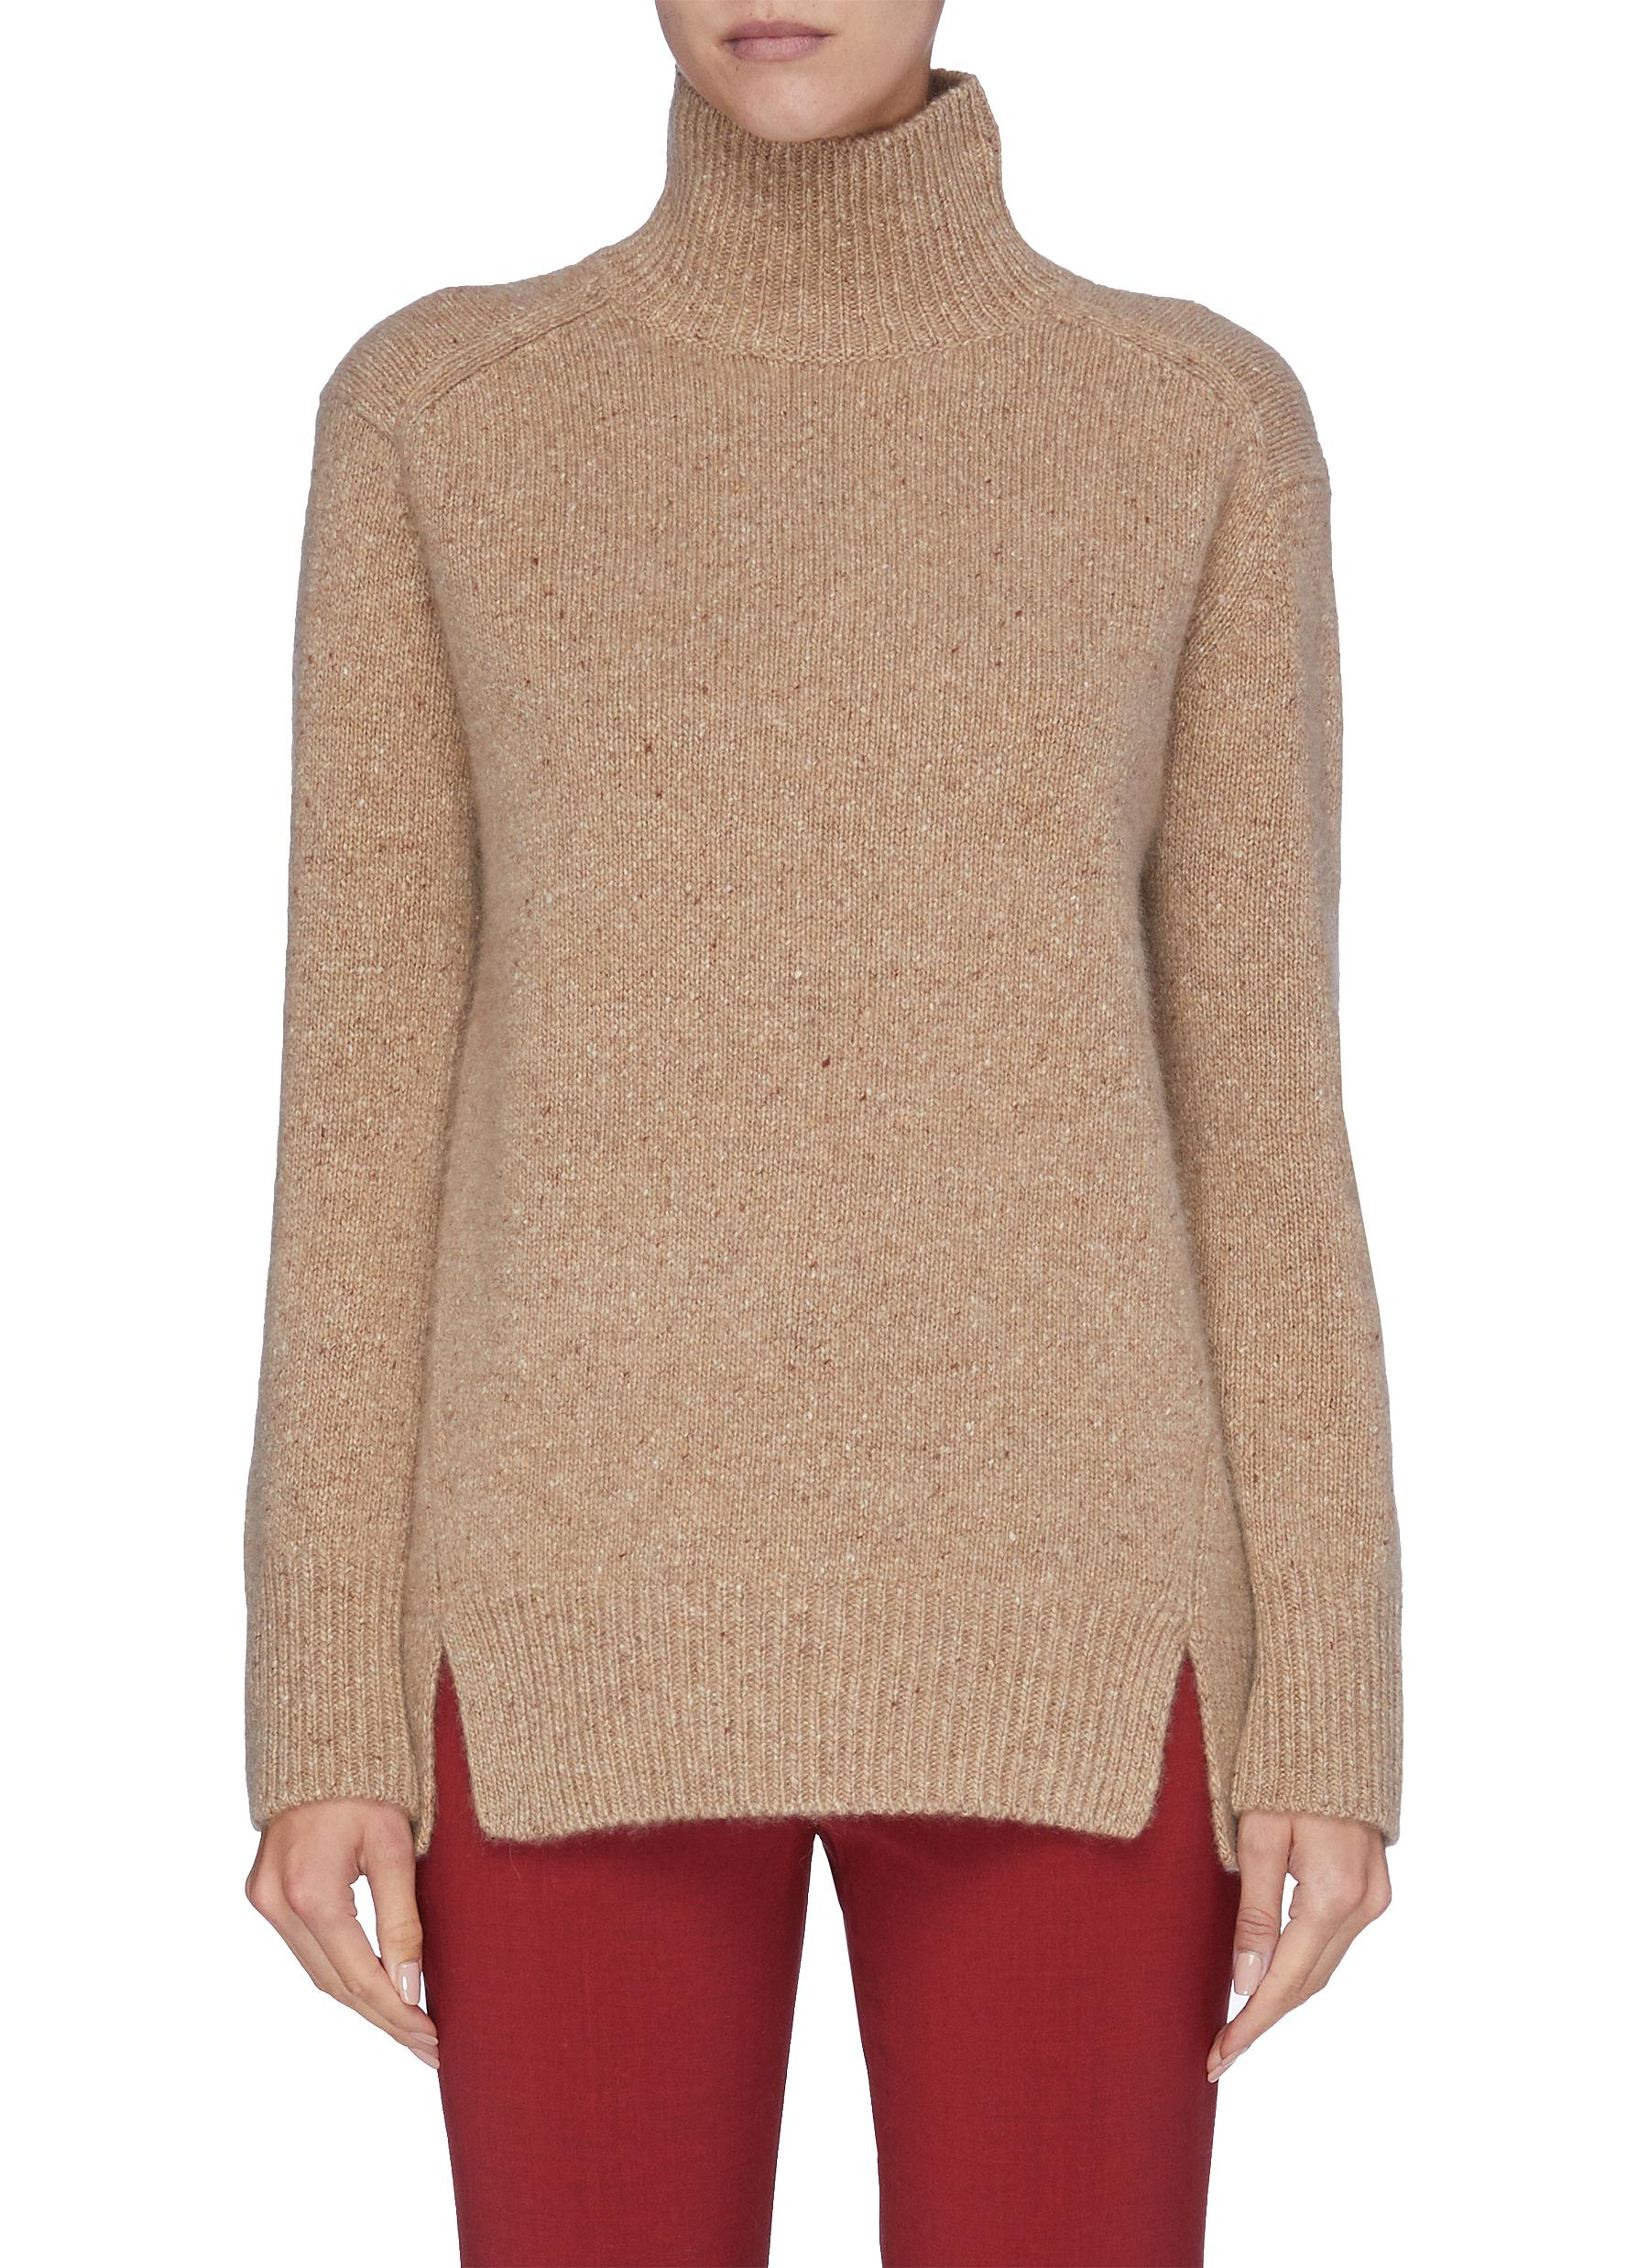 Slit hem turtleneck cashmere sweater by Vince